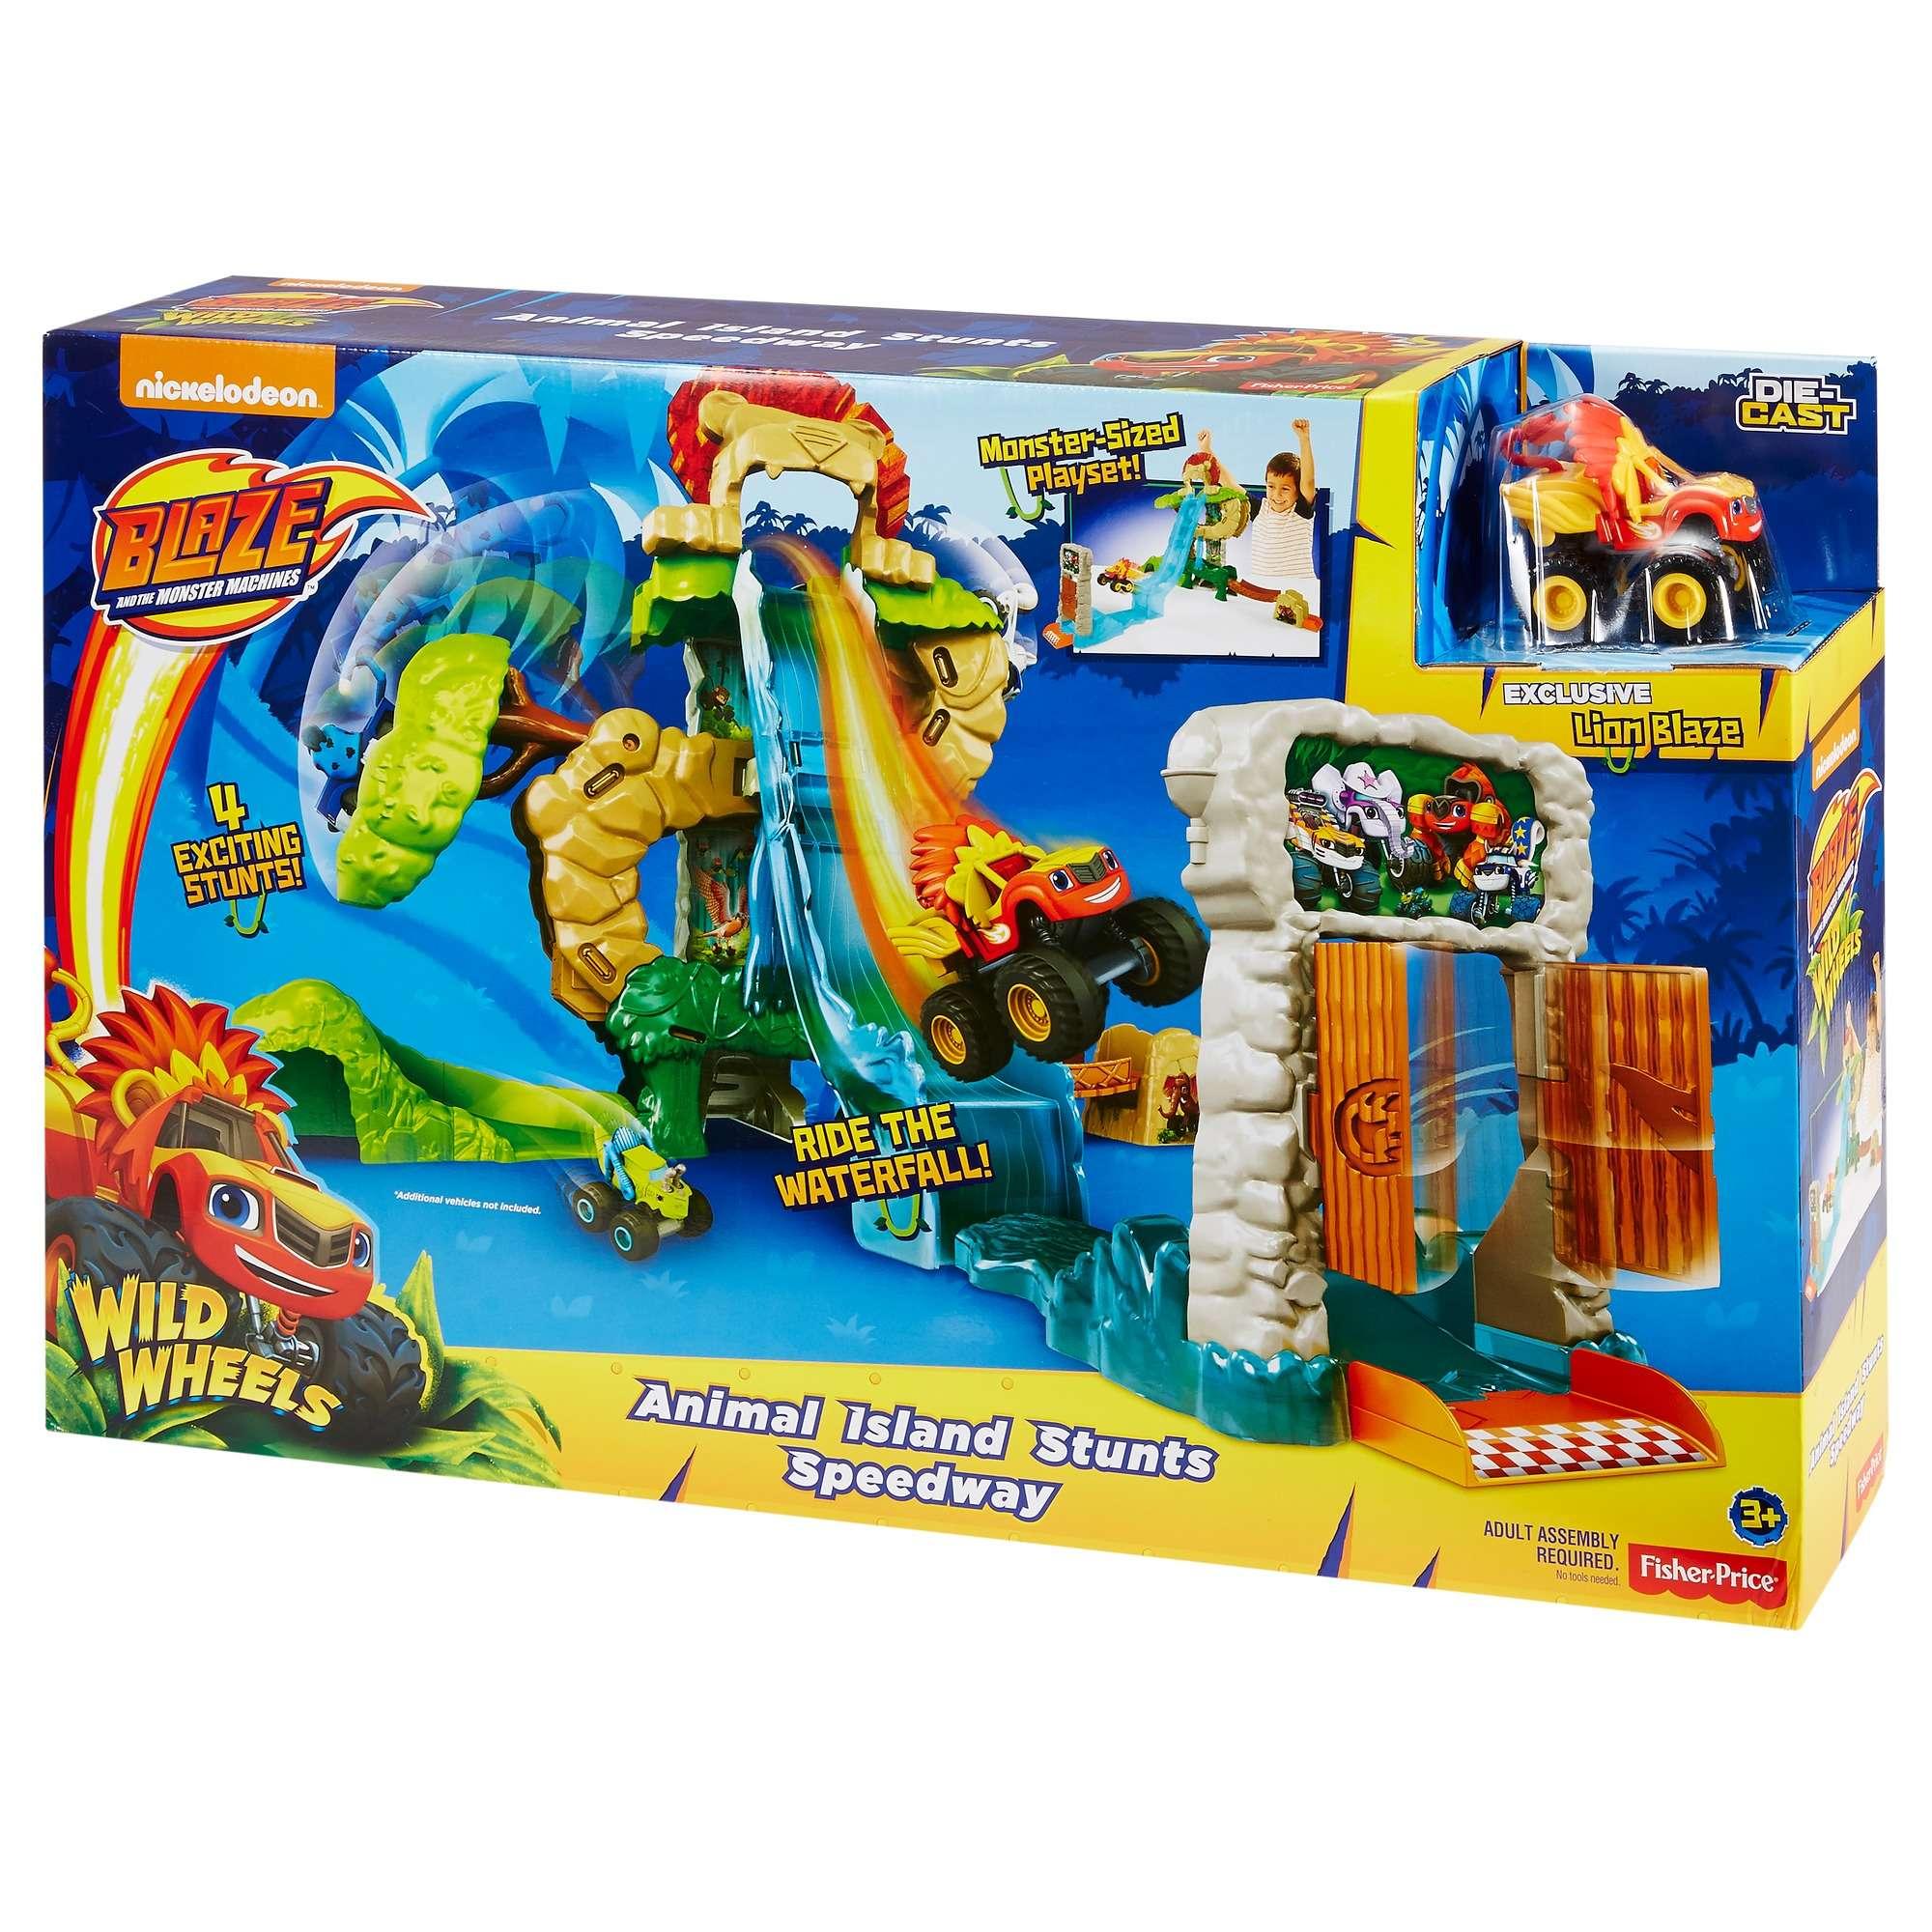 Nickelodeon Blaze and the Monster Machines, Animal Island Stunts Speedway Google Express $10.00 /  $13.50 Walmart